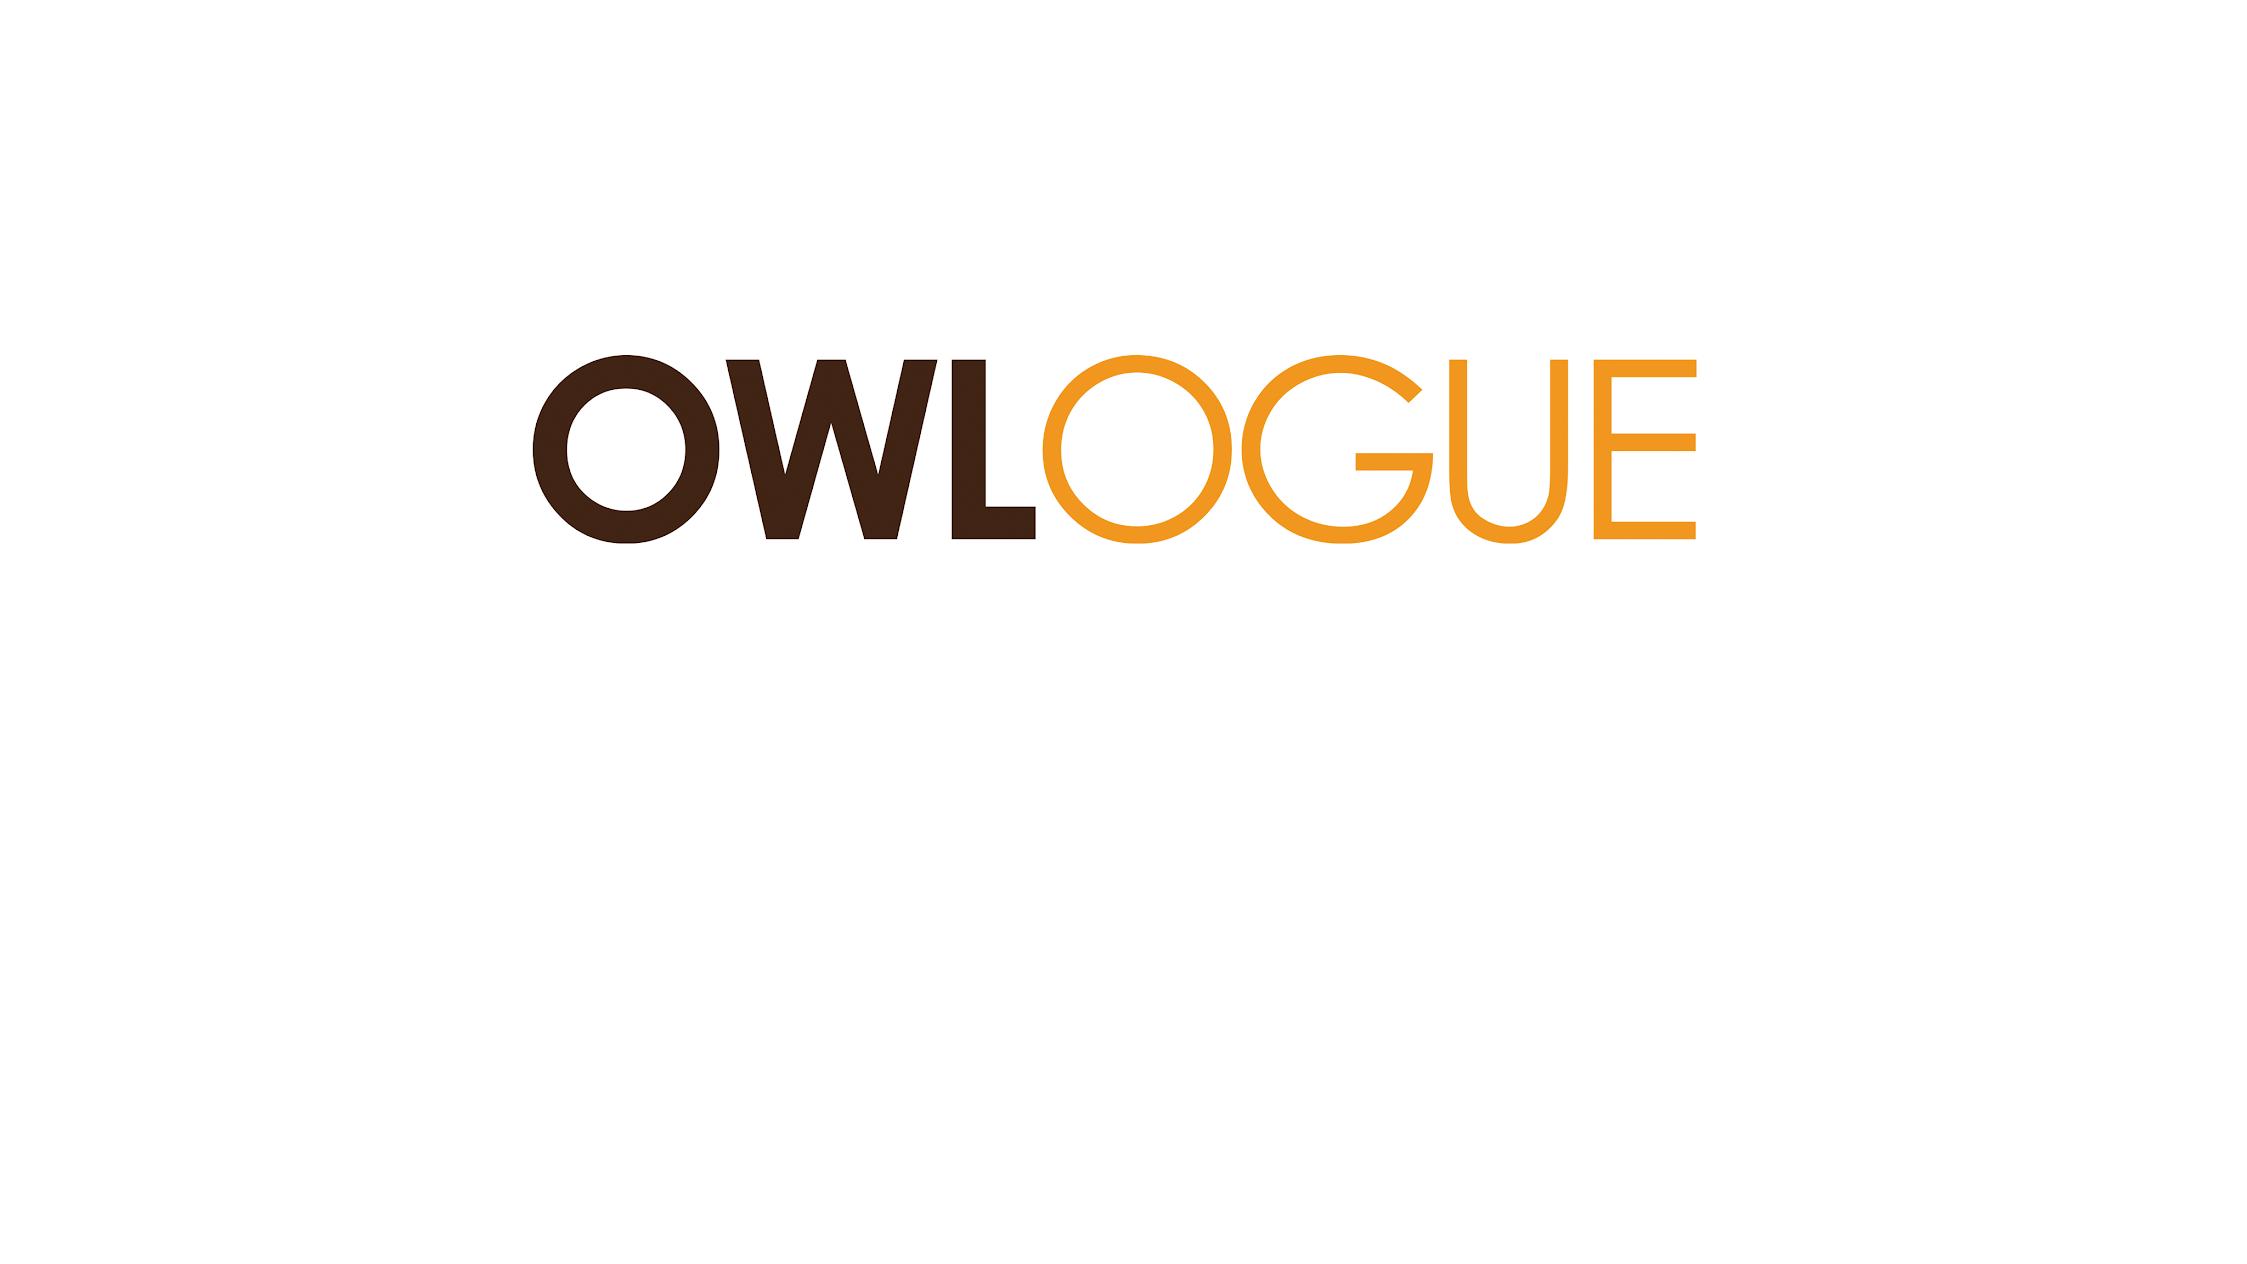 OWLOGUE Co., Ltd.